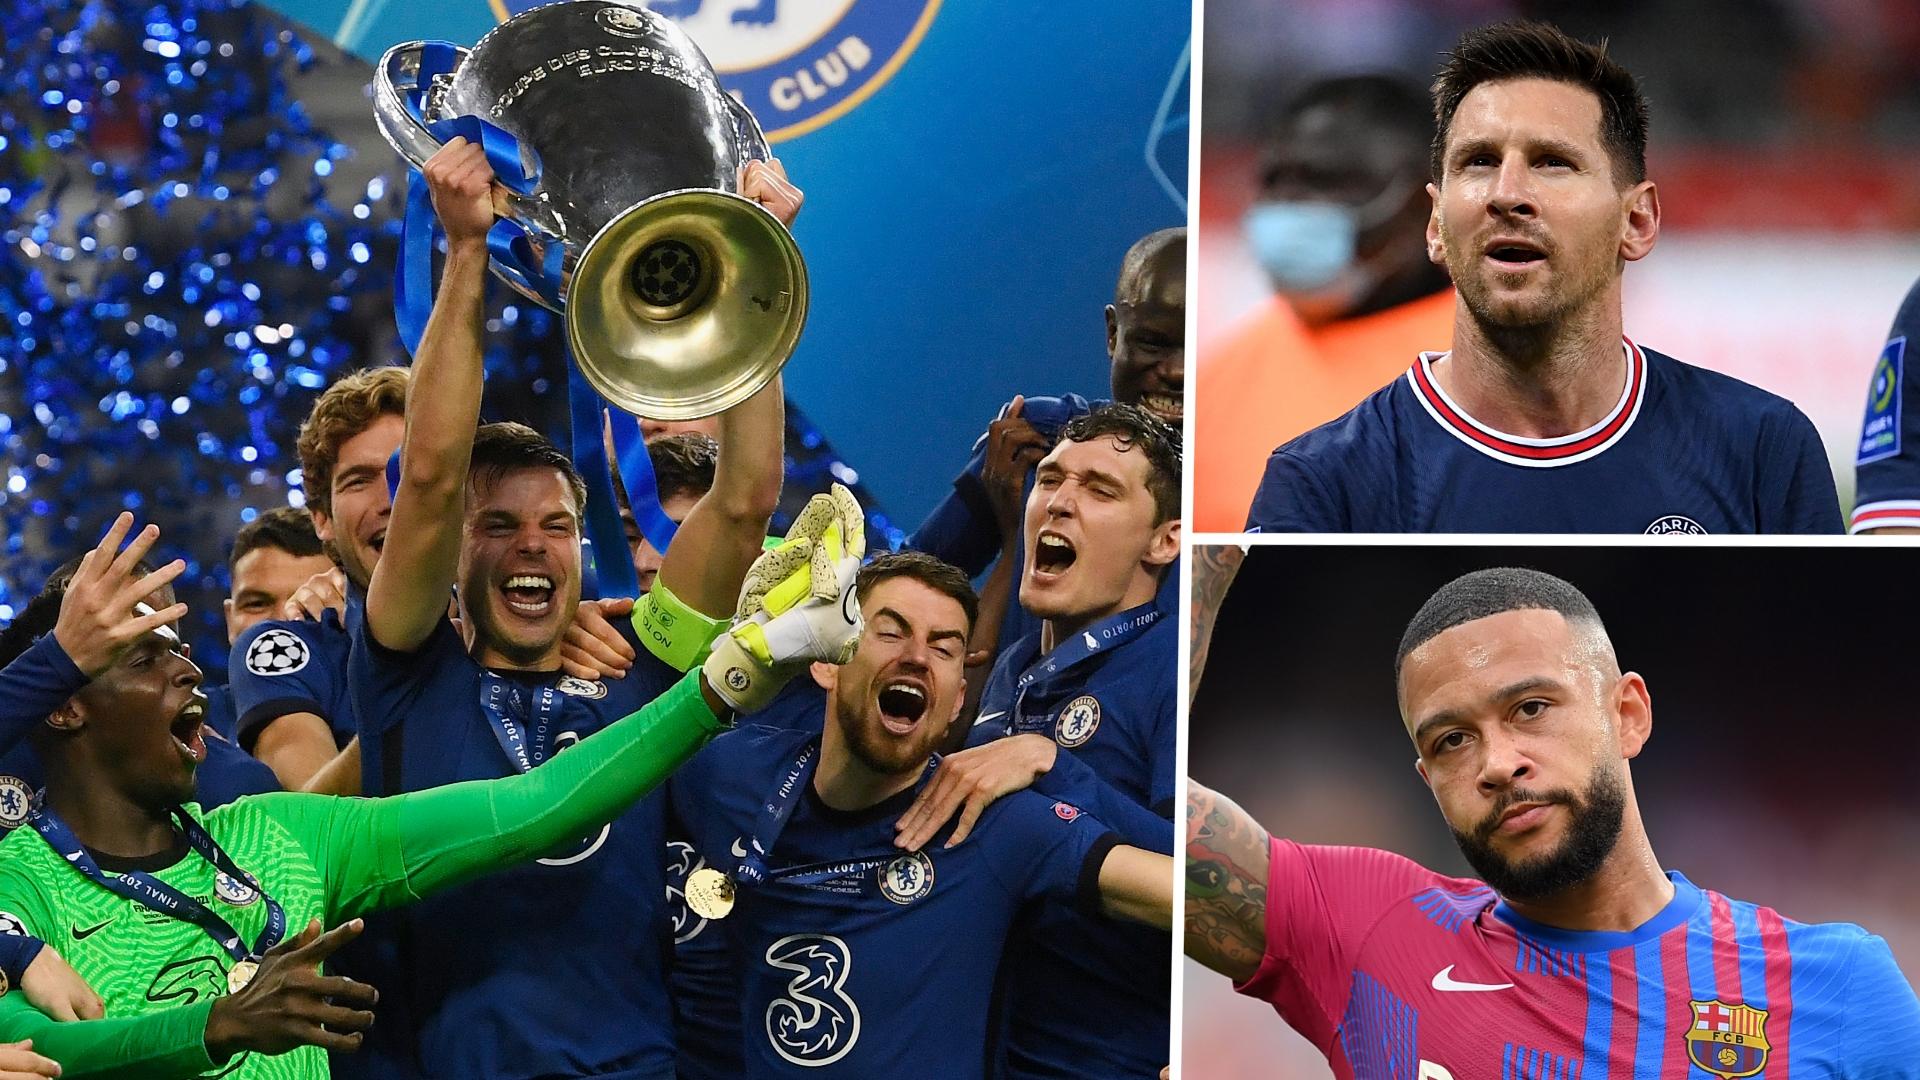 Champions League 2021-22 Power Rankings: Barcelona kick off outside the top 10